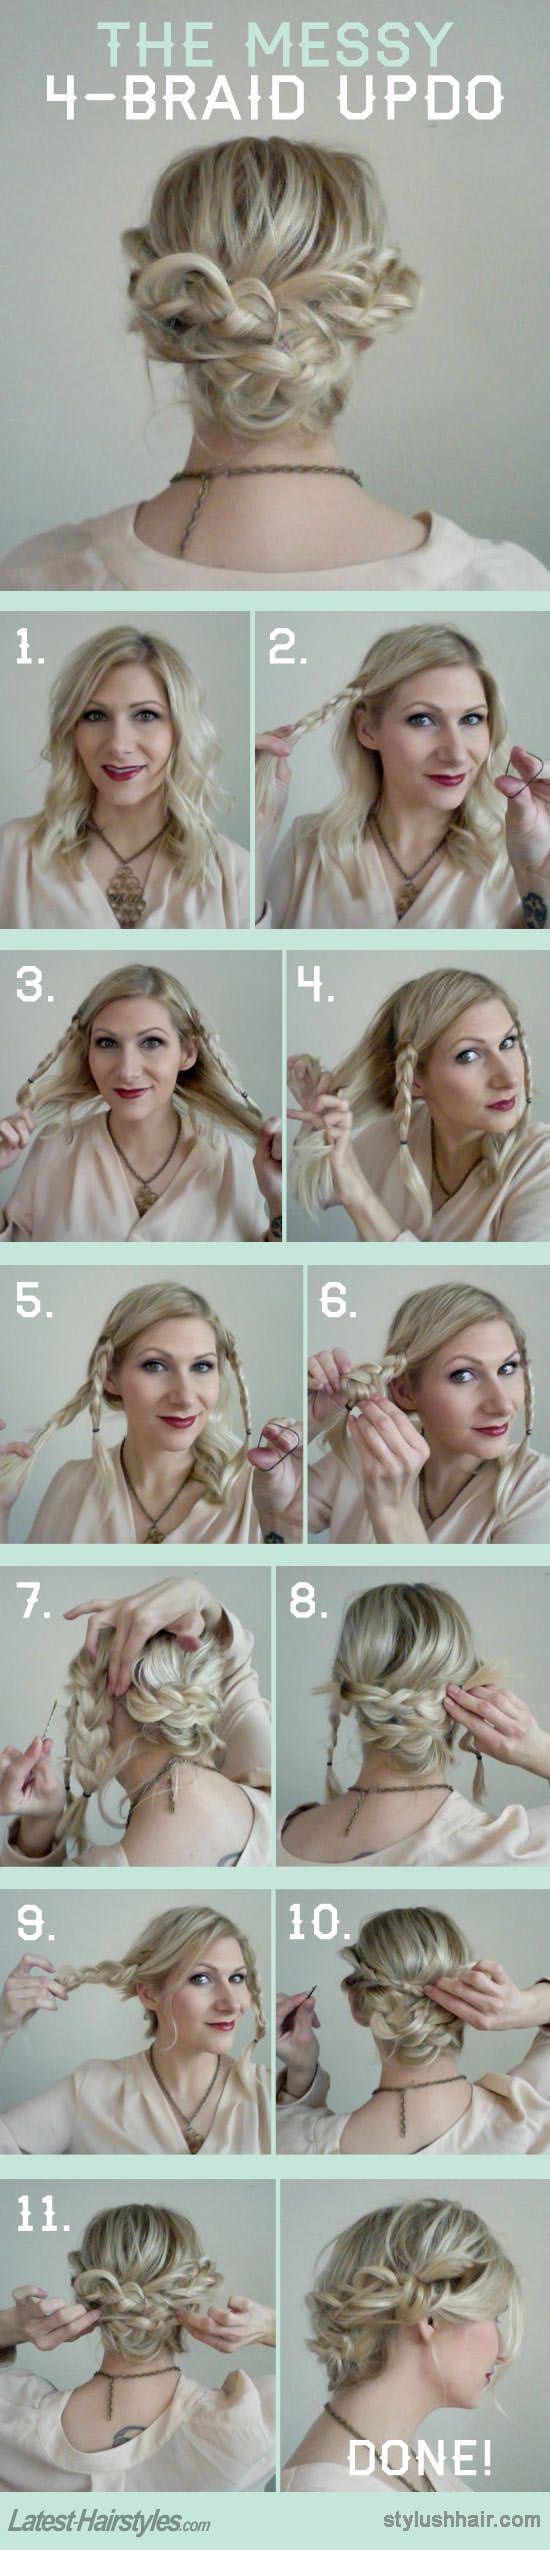 TAGS; DIY · Medium Hairstyles · Tutorials